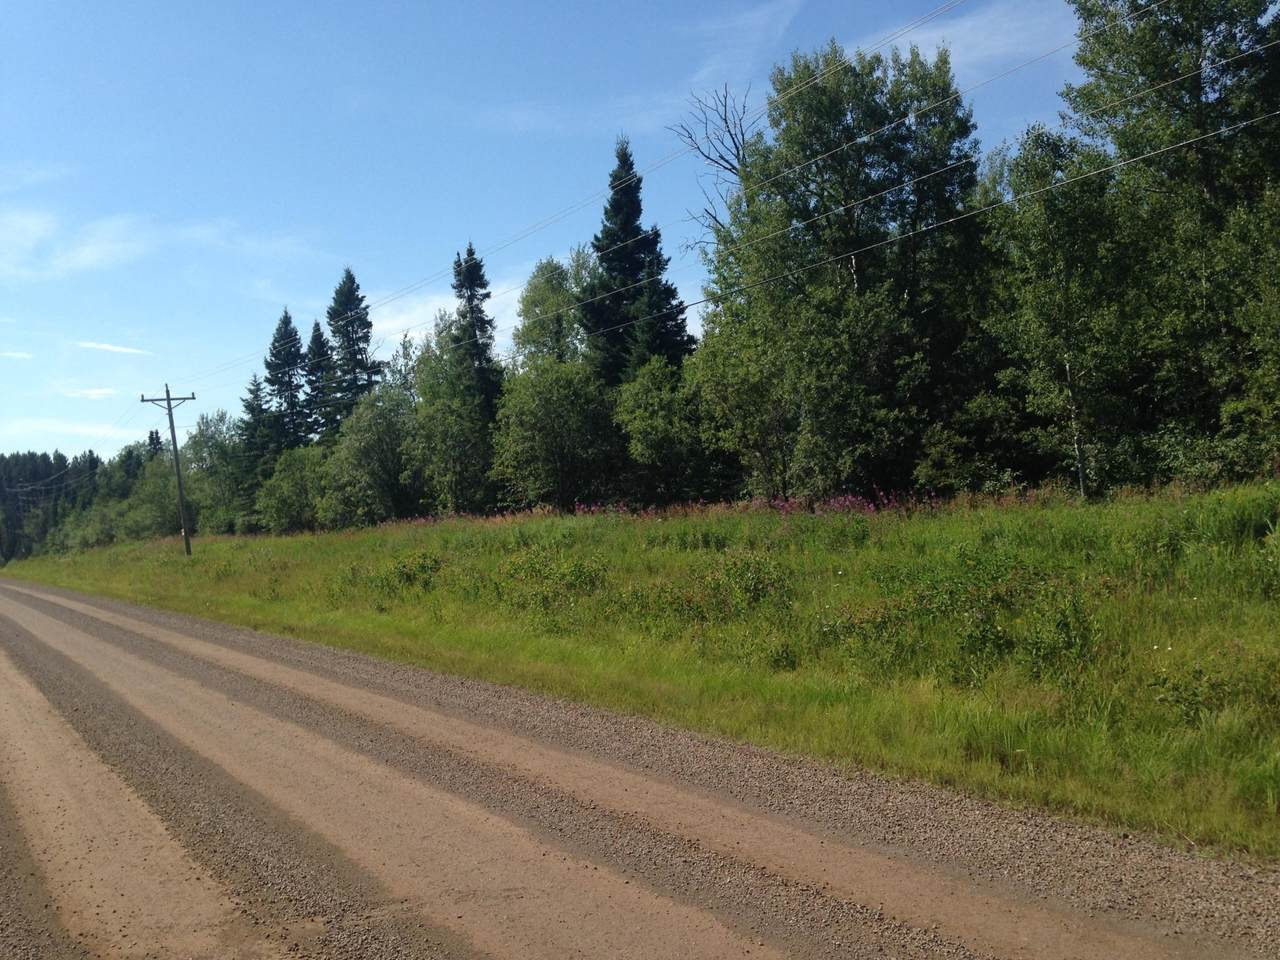 000 County Road 6 - Photo 1